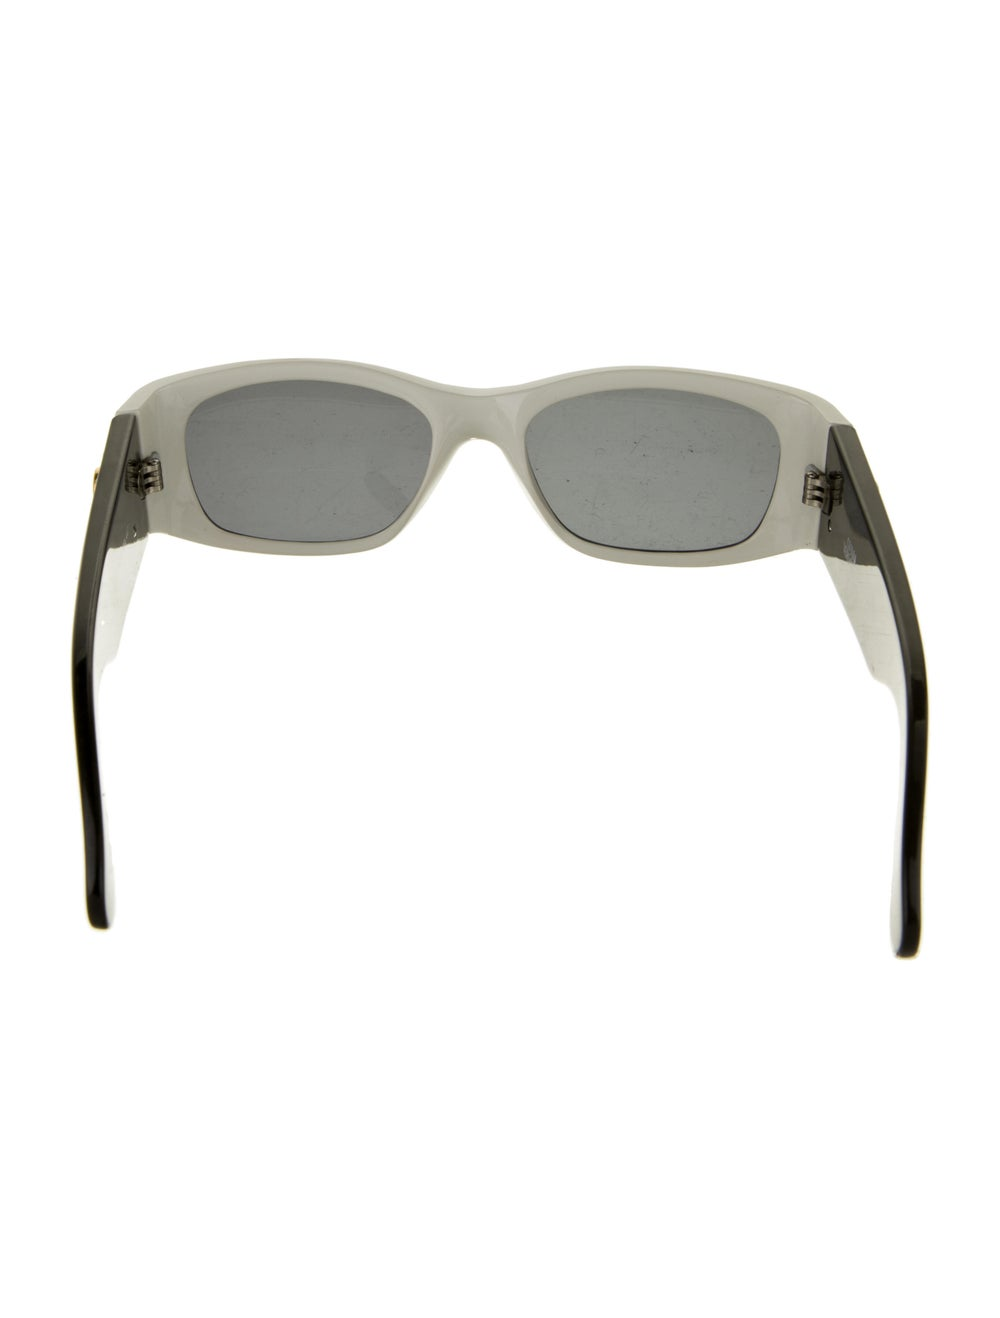 Gianni Versace Square Tinted Sunglasses Black - image 3